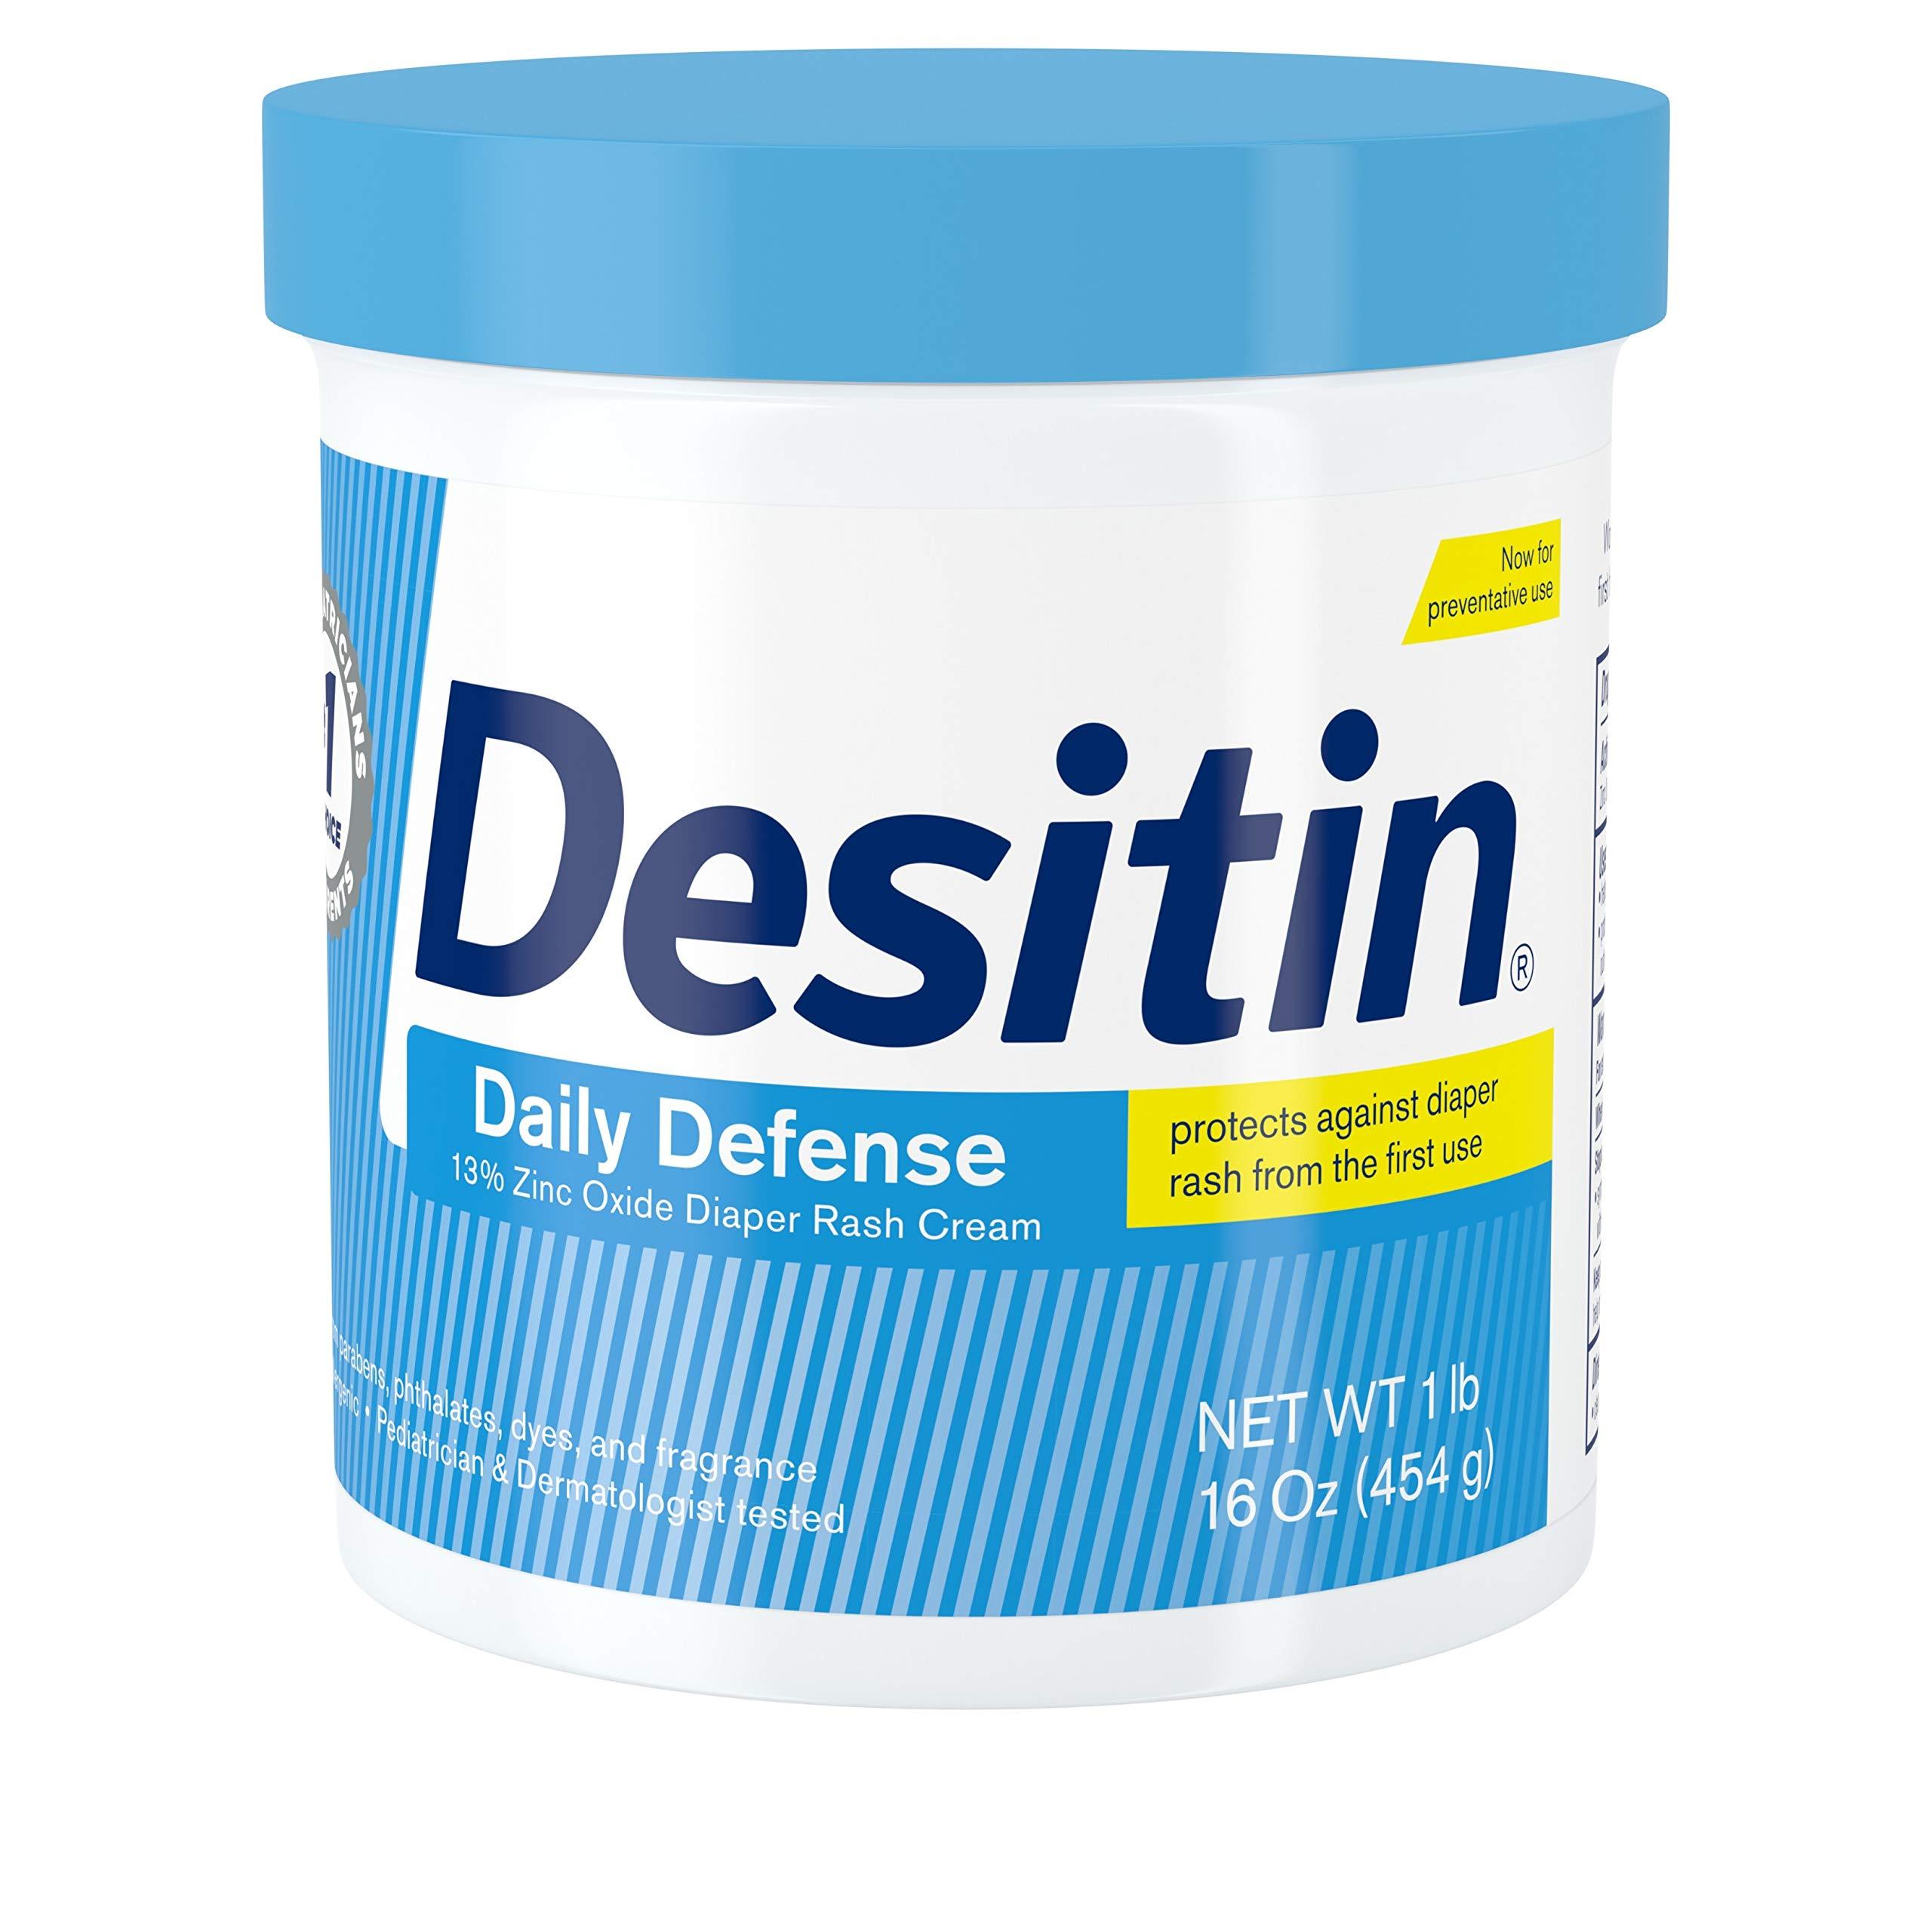 Desitin Rapid Relief Diaper Rash Remedy, Fragrance-Free Cream, 16 Oz. by Desitin